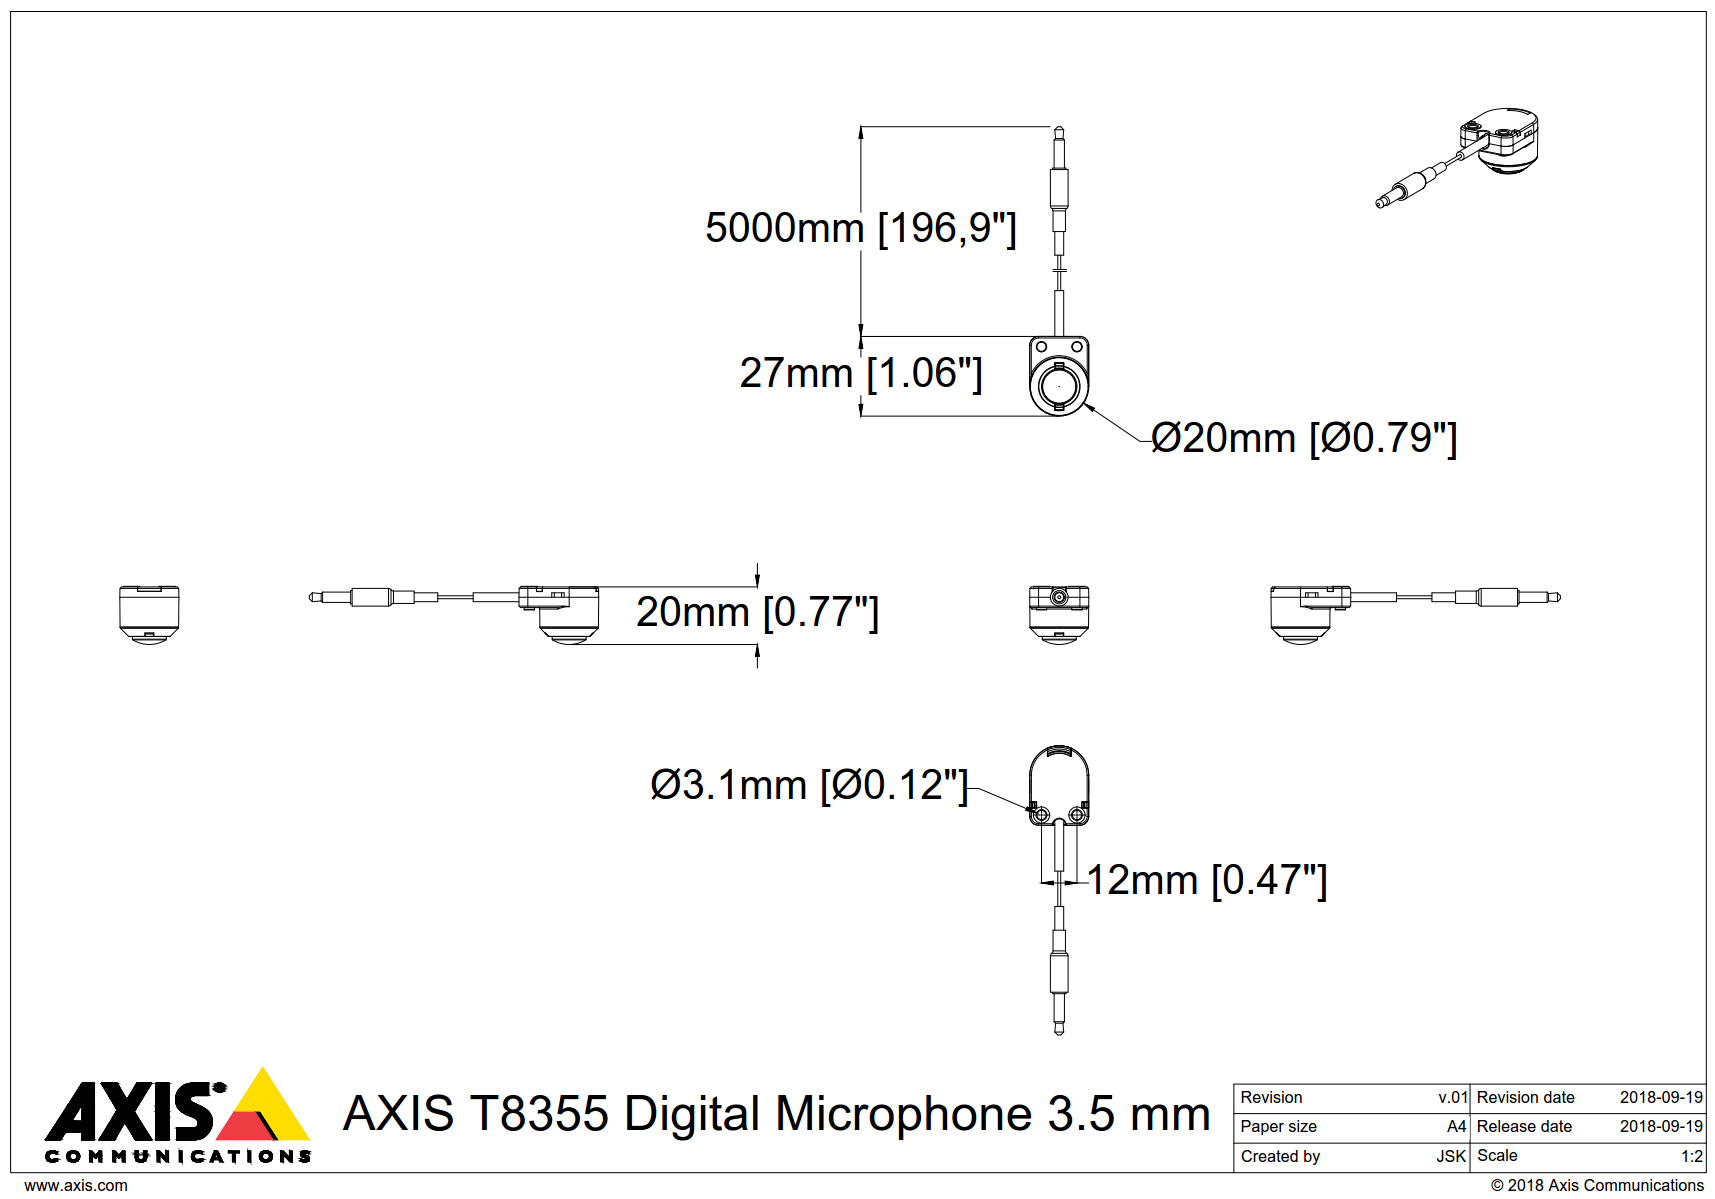 T8355 Dimensions